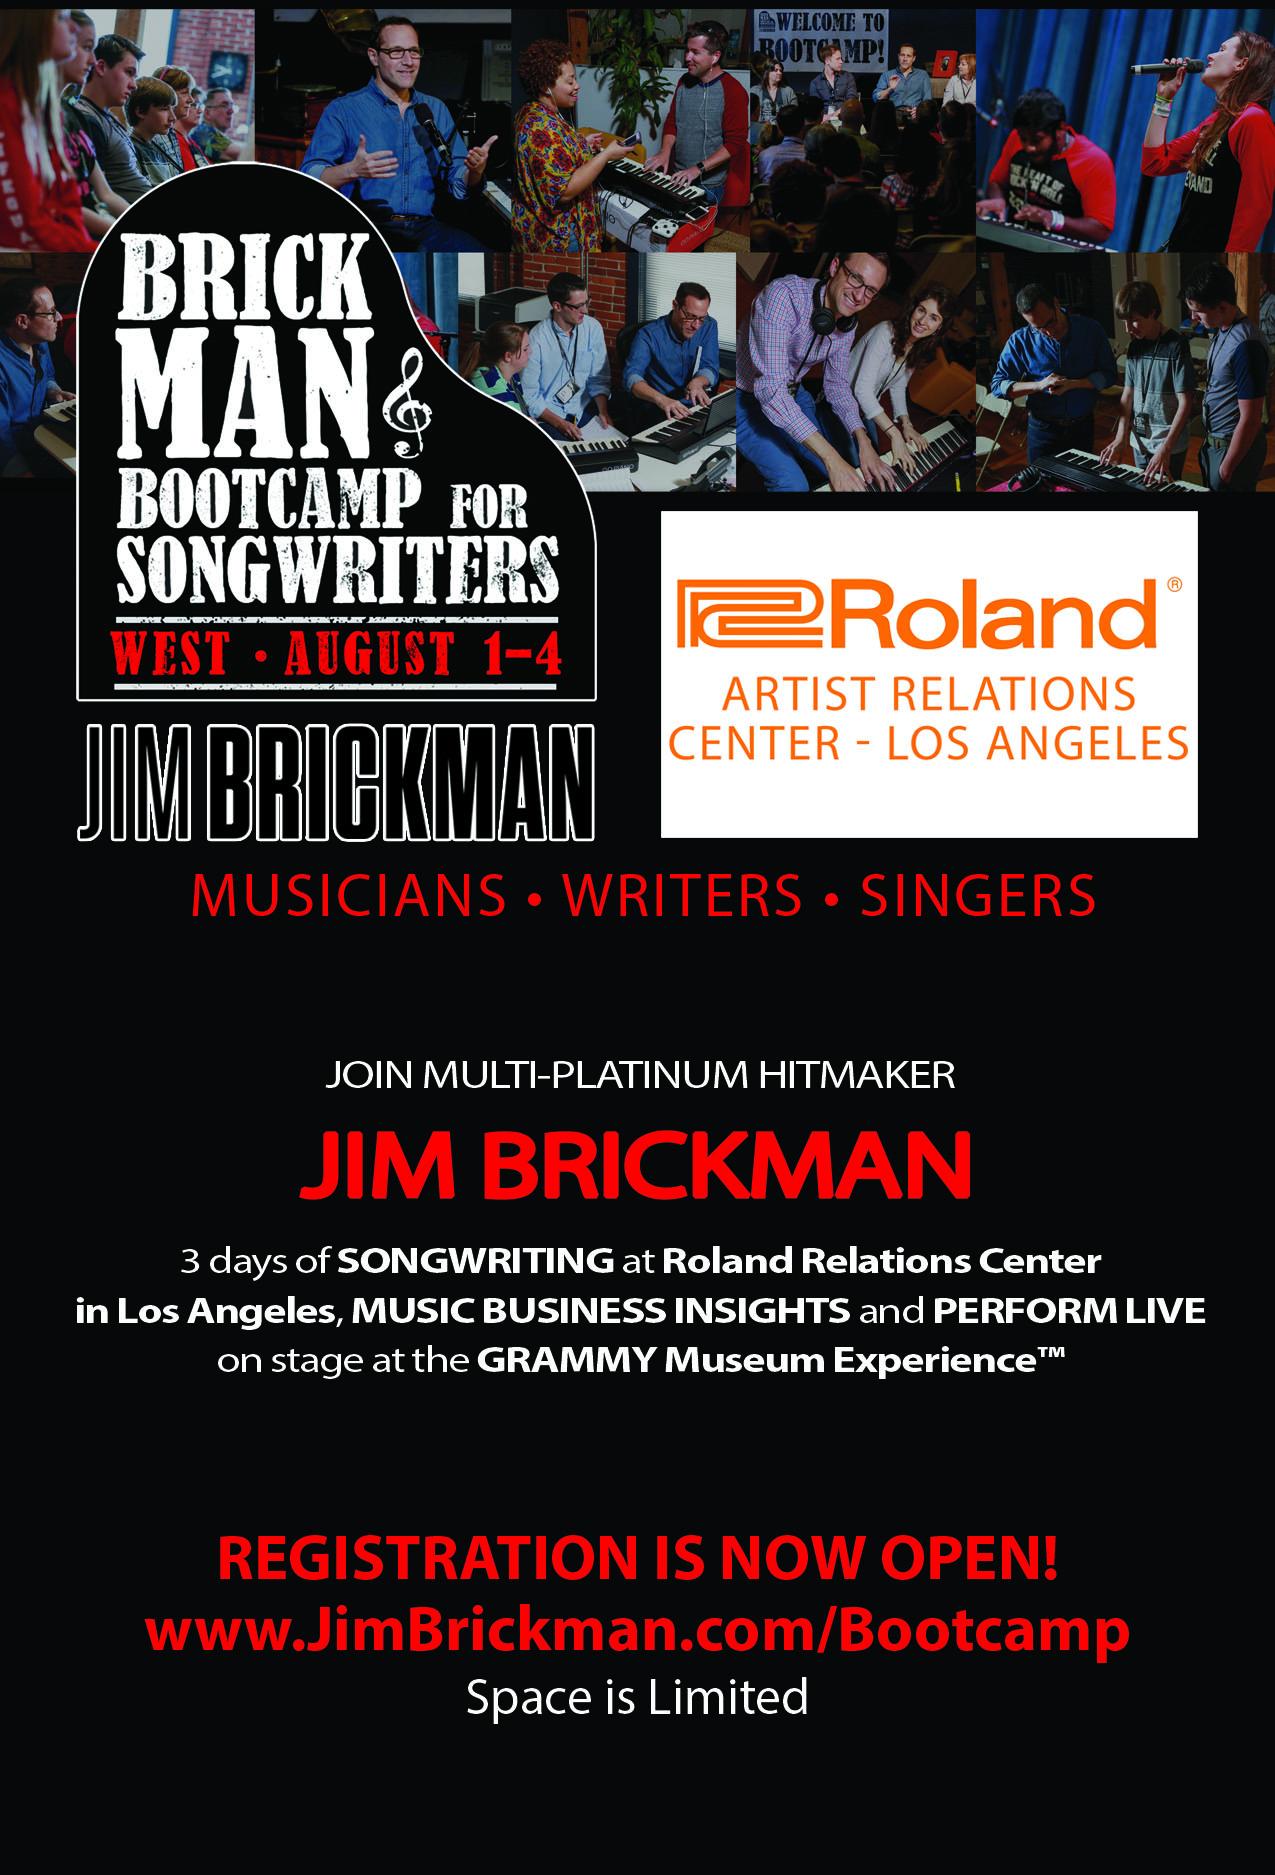 brick-man-bootcamp-event-michelles-piano-in-portland-or